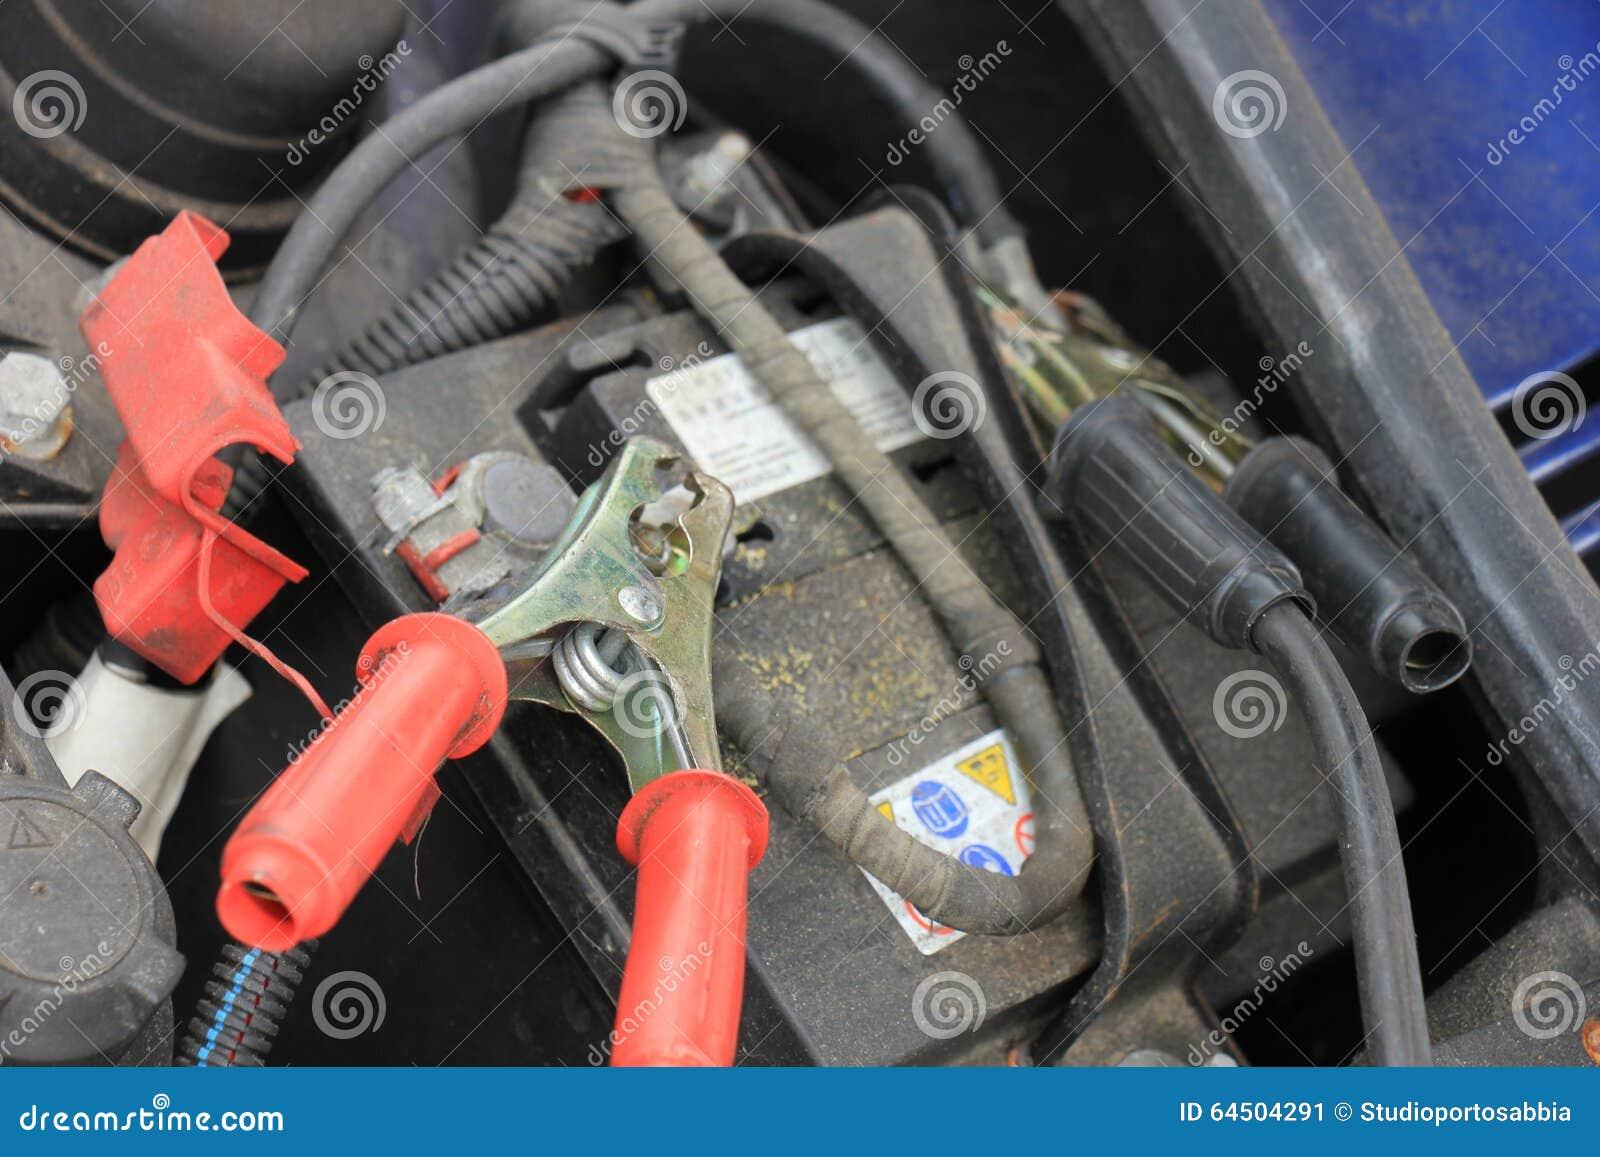 car battery charging stock image image of automotive 64504291. Black Bedroom Furniture Sets. Home Design Ideas